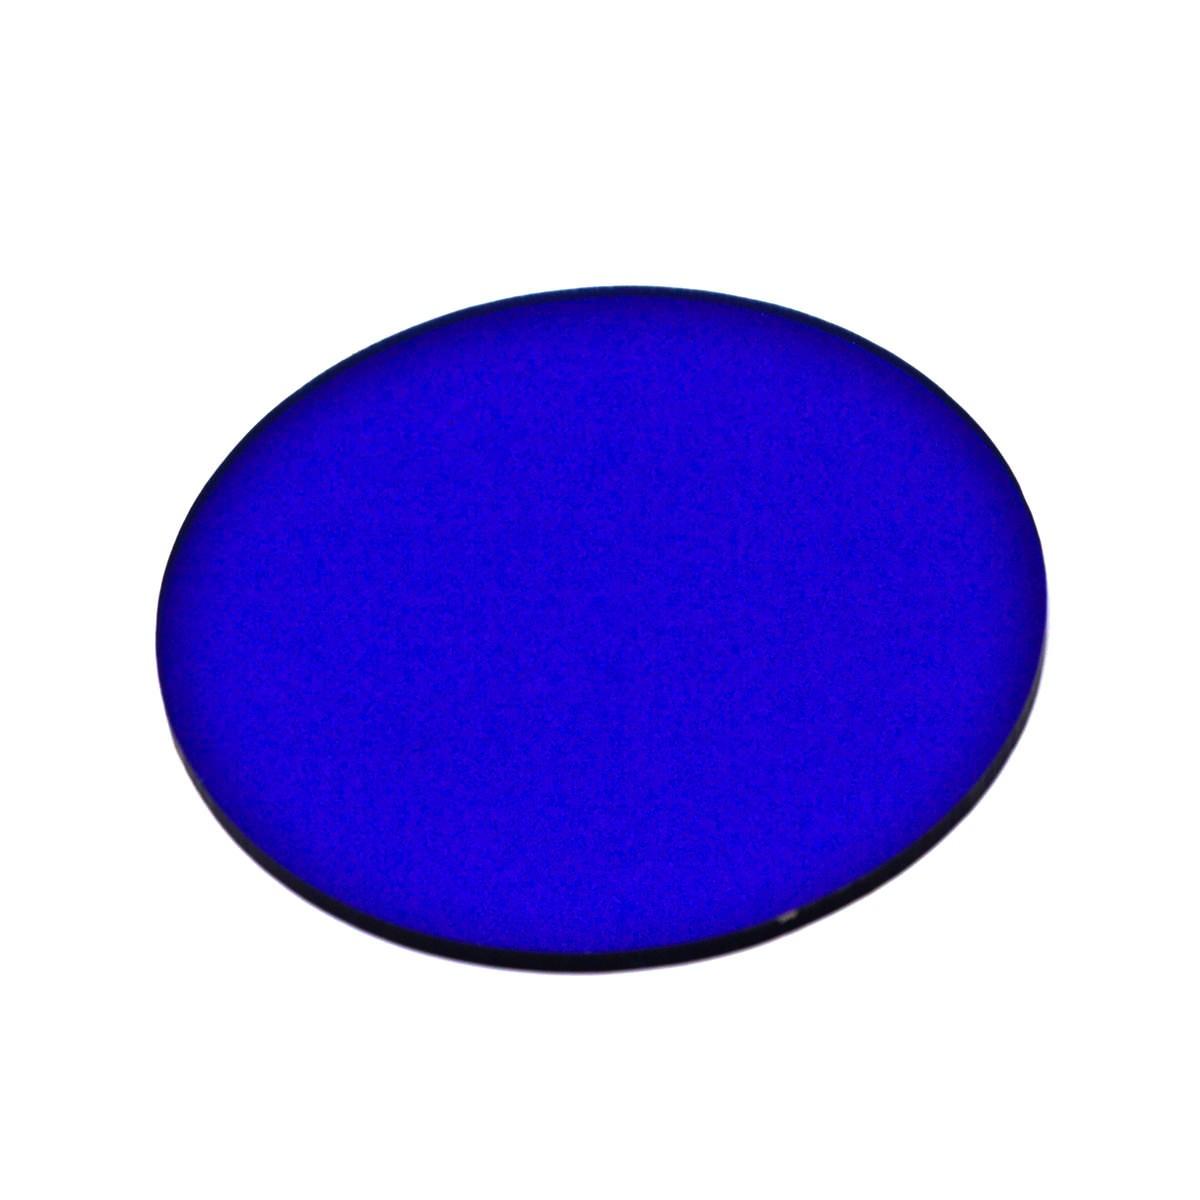 Amron International 7100 Series Chamber Light Blue Lens Filter